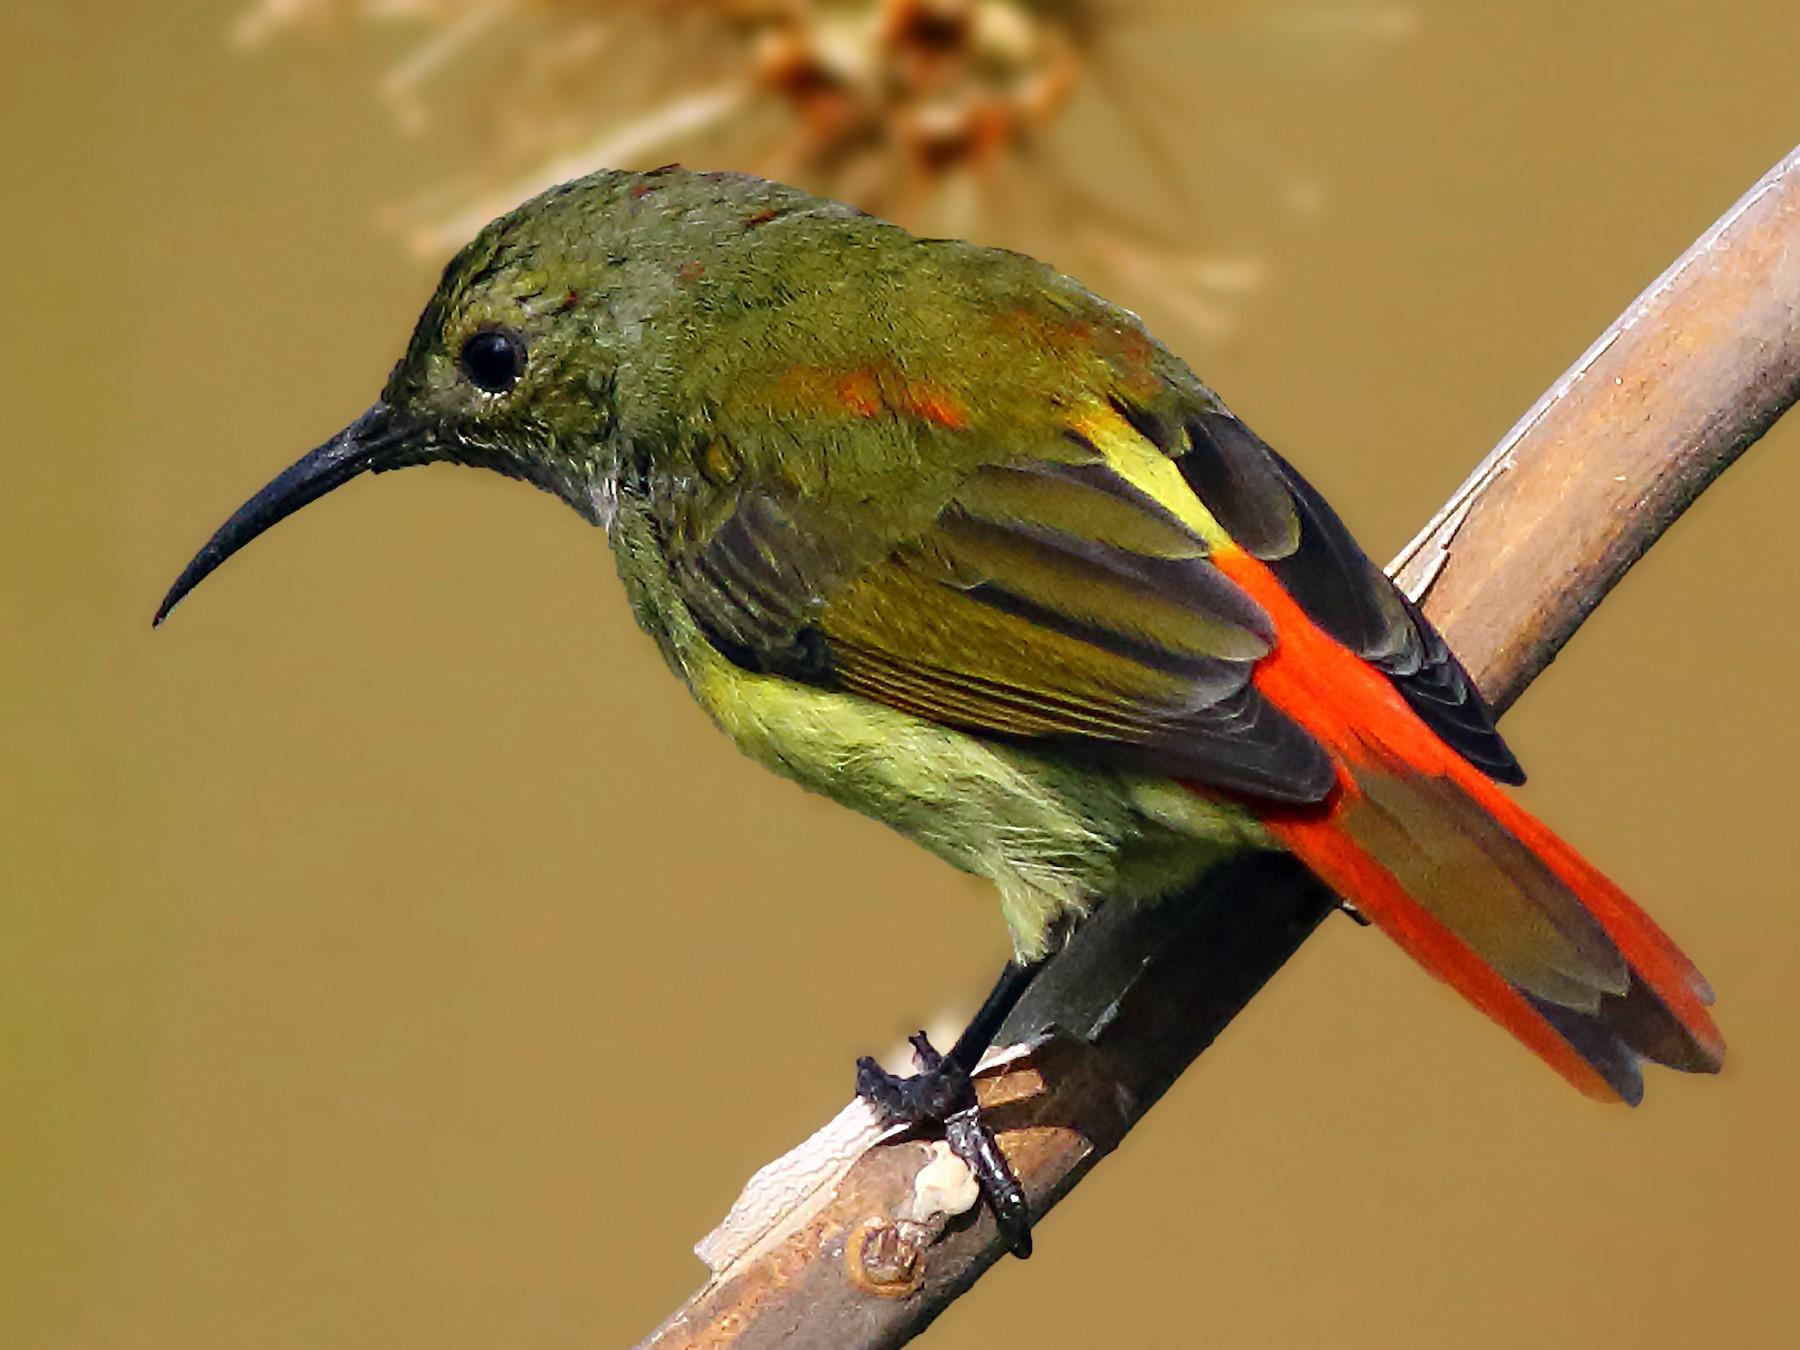 Fire-tailed Sunbird - Amitava Ganguly